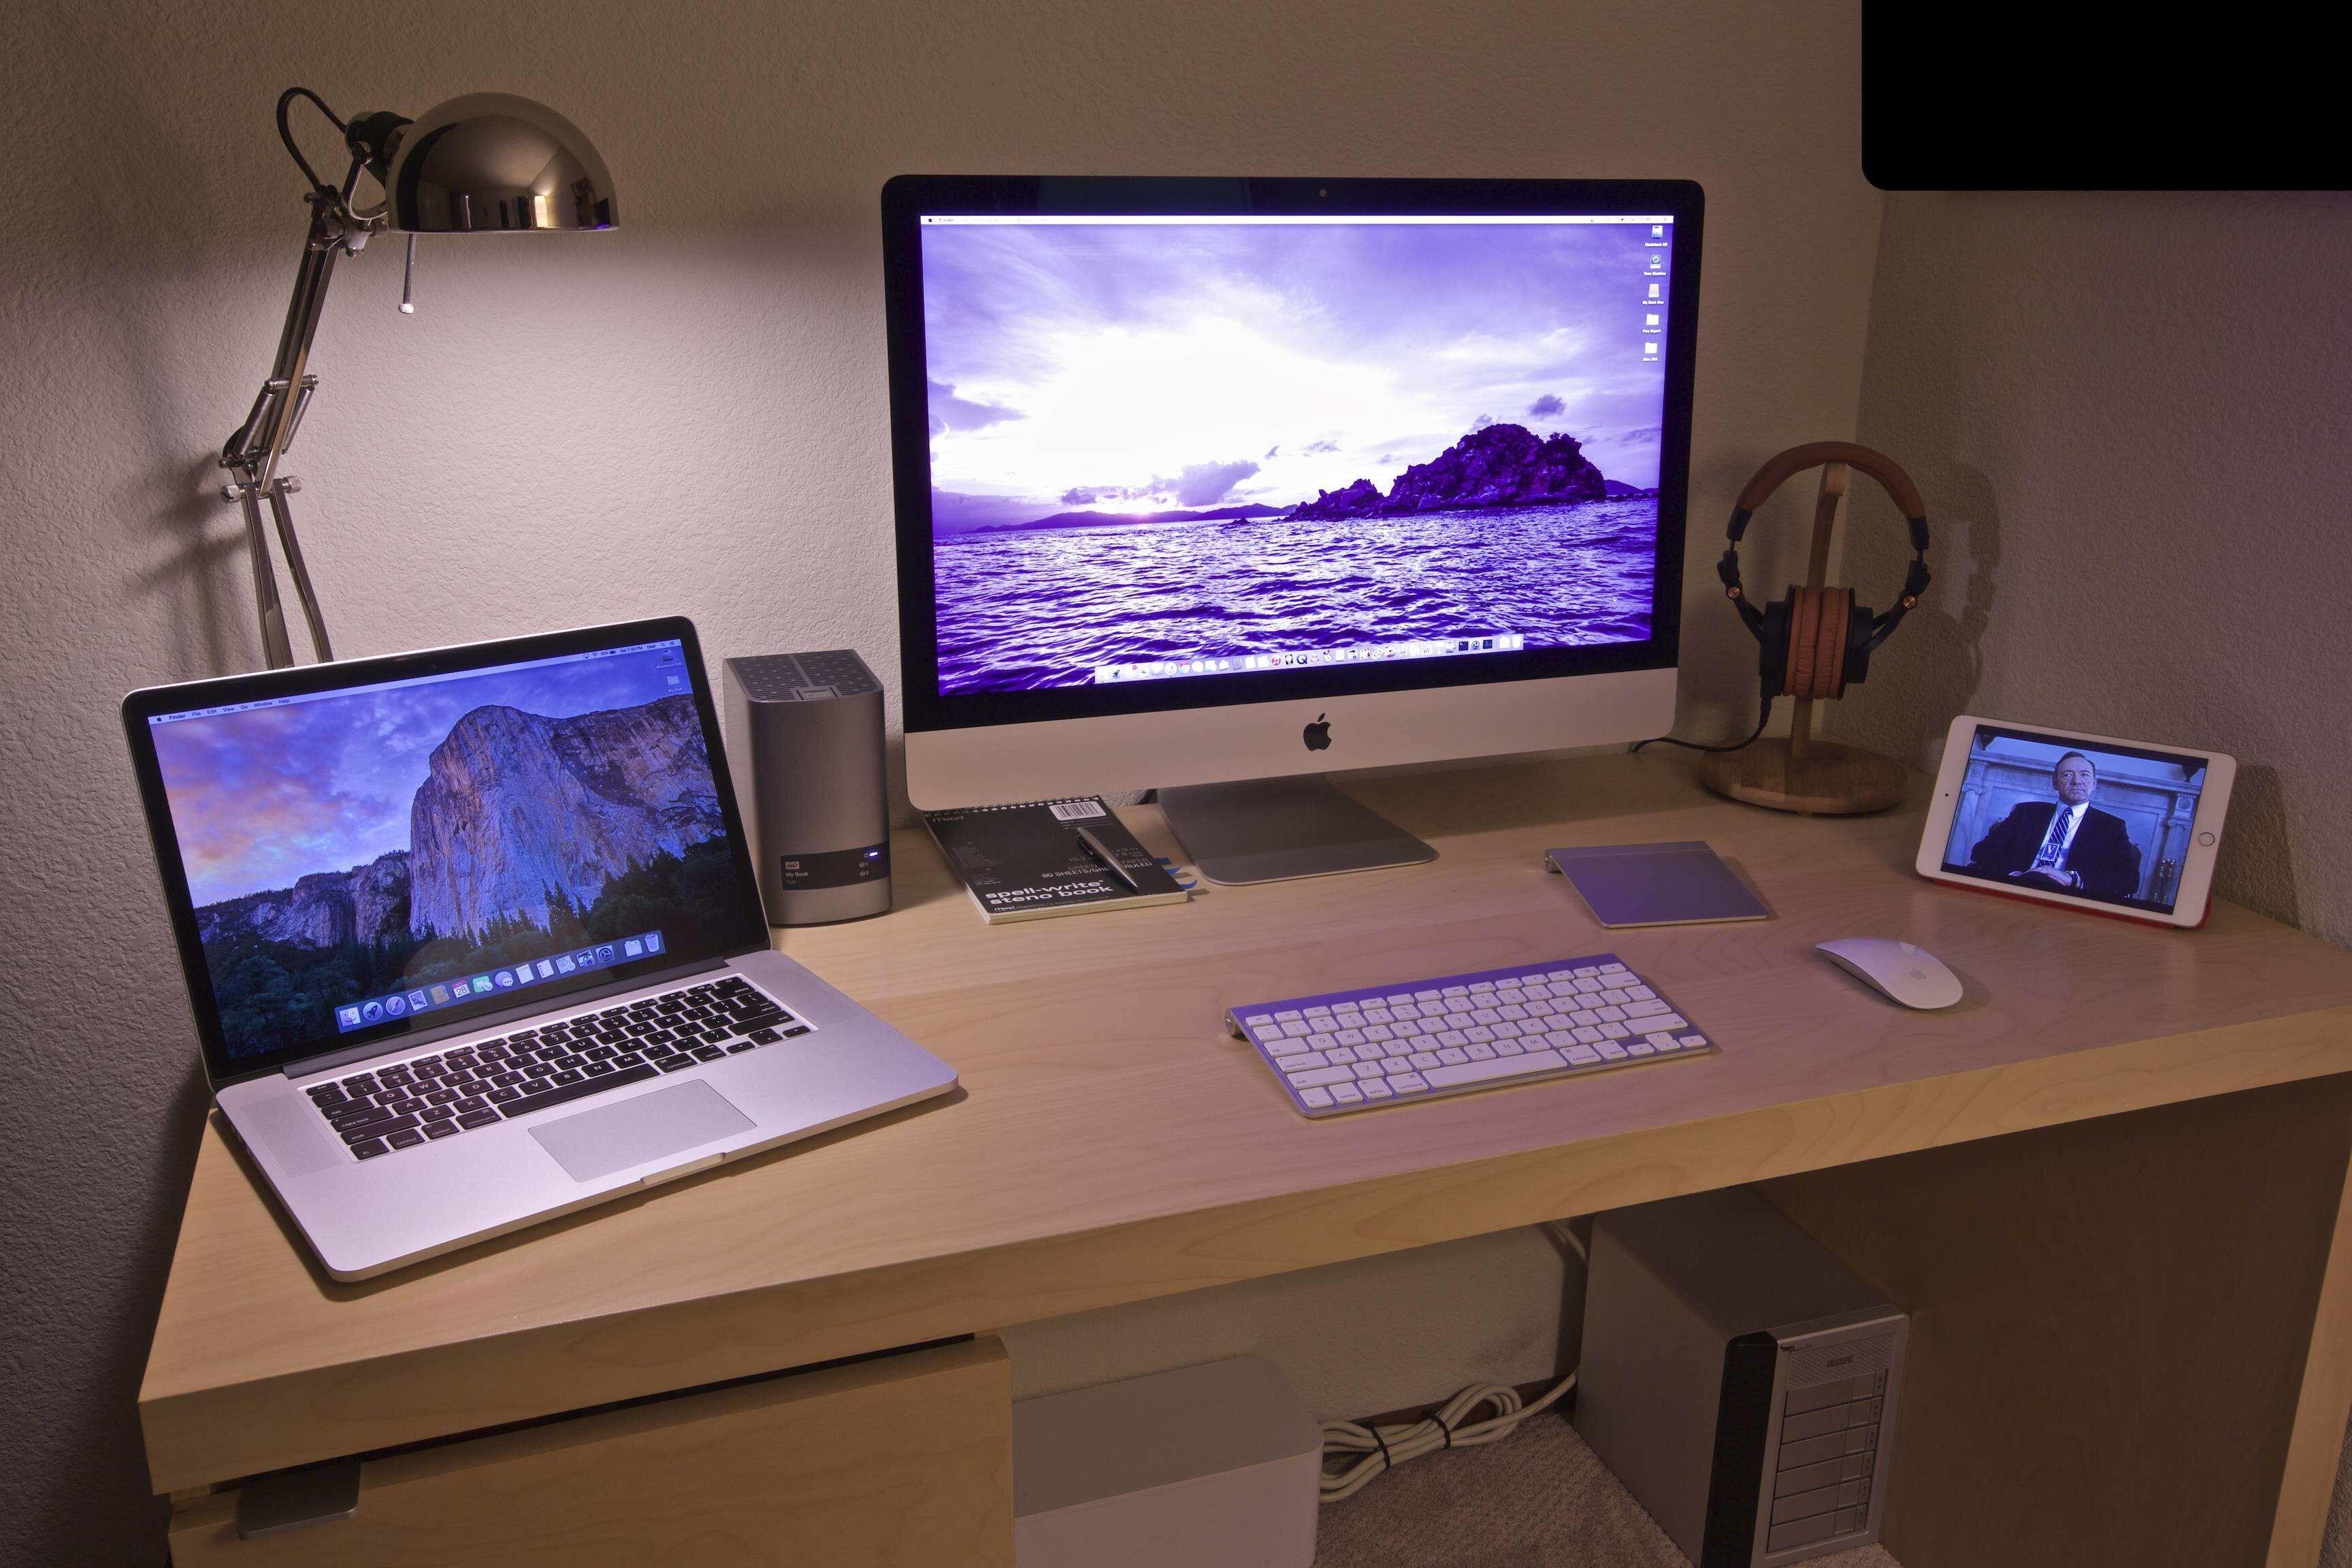 Apple Imac 5K  27 Inch Retina Display, Quad Core